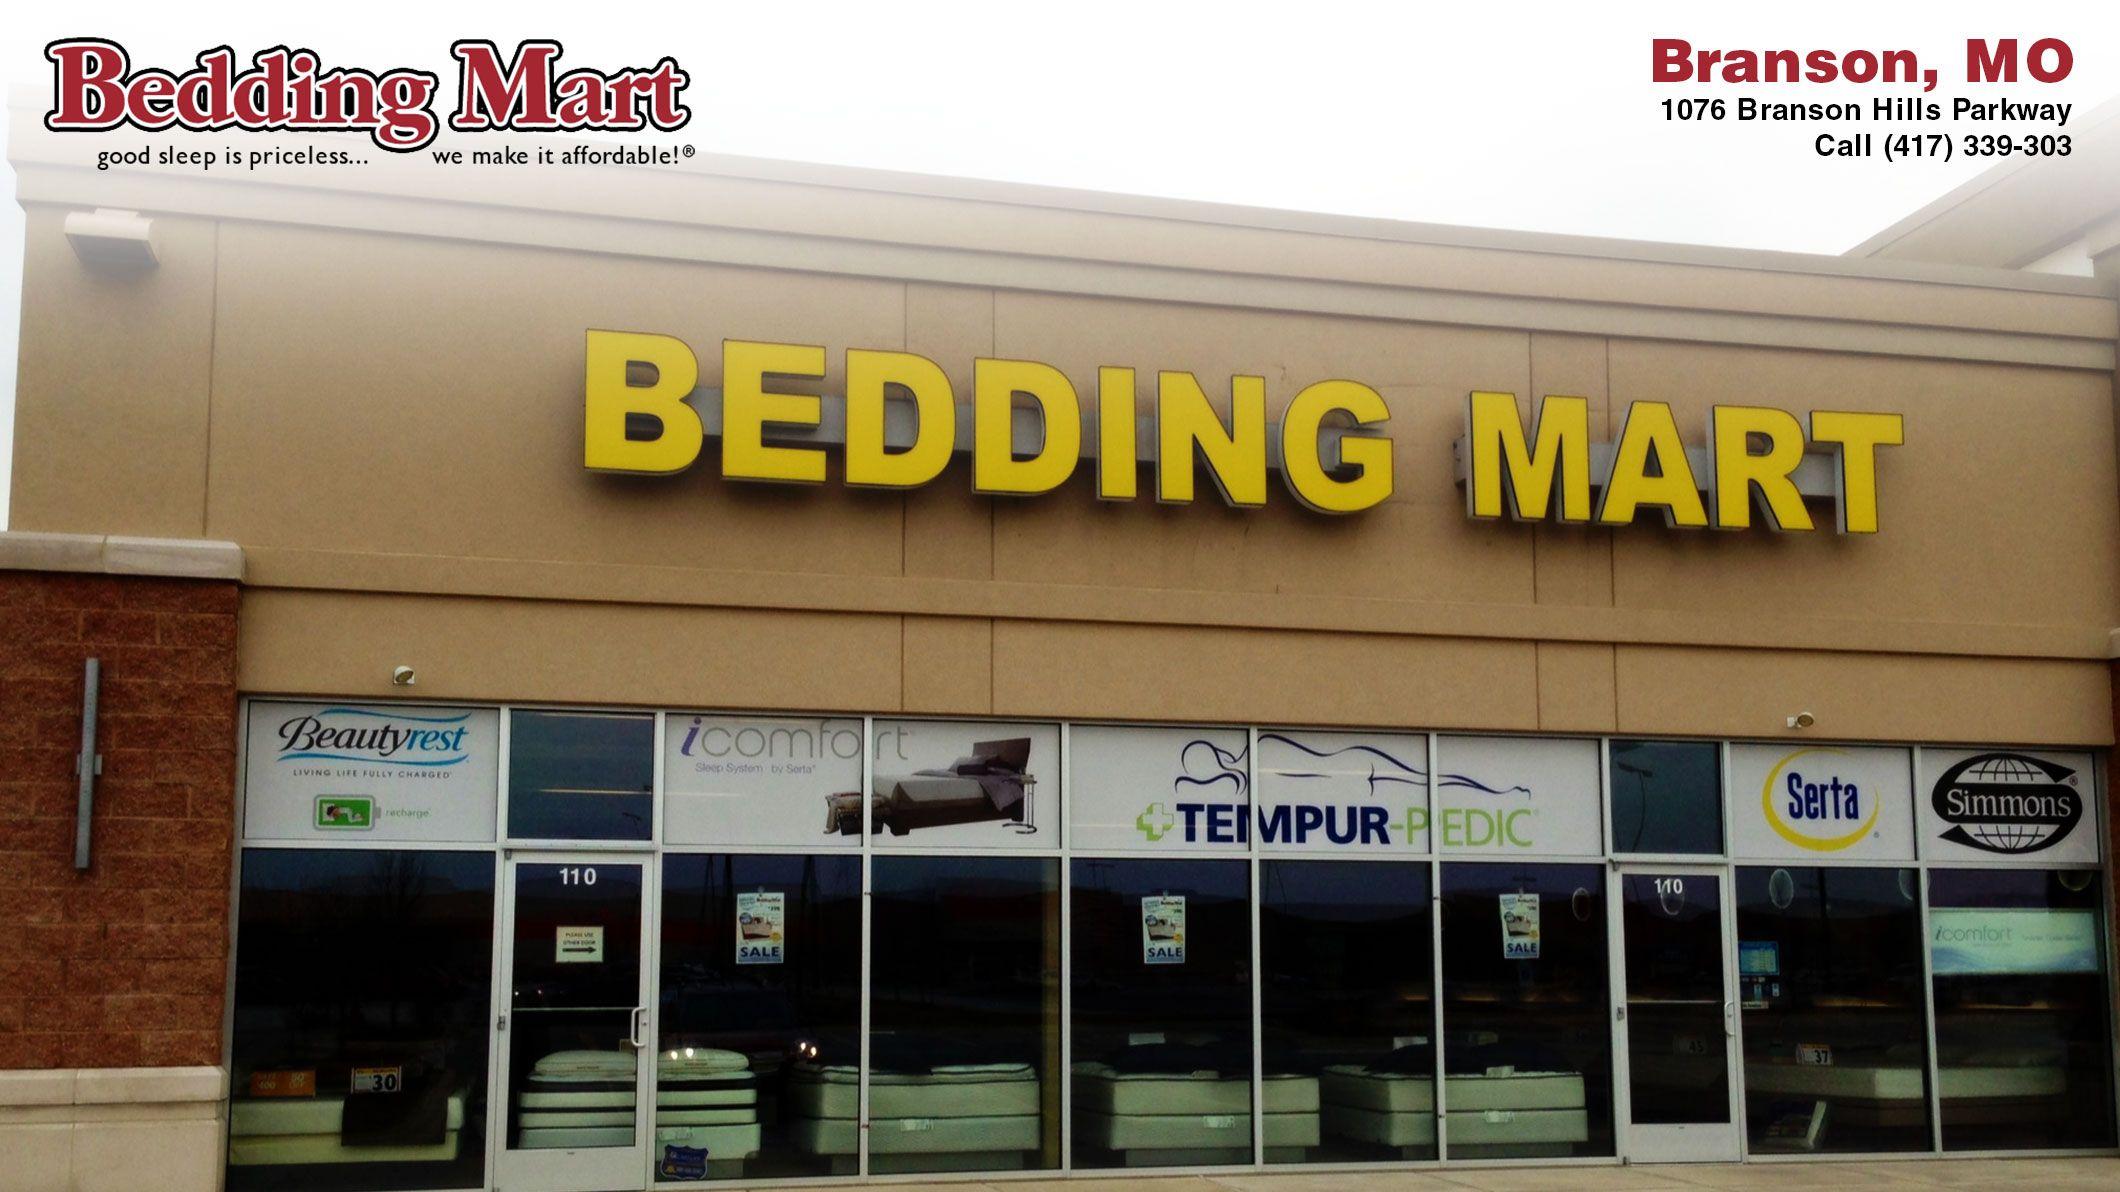 Http Thebeddingmart Com Locations 1 Branson Missouri Html